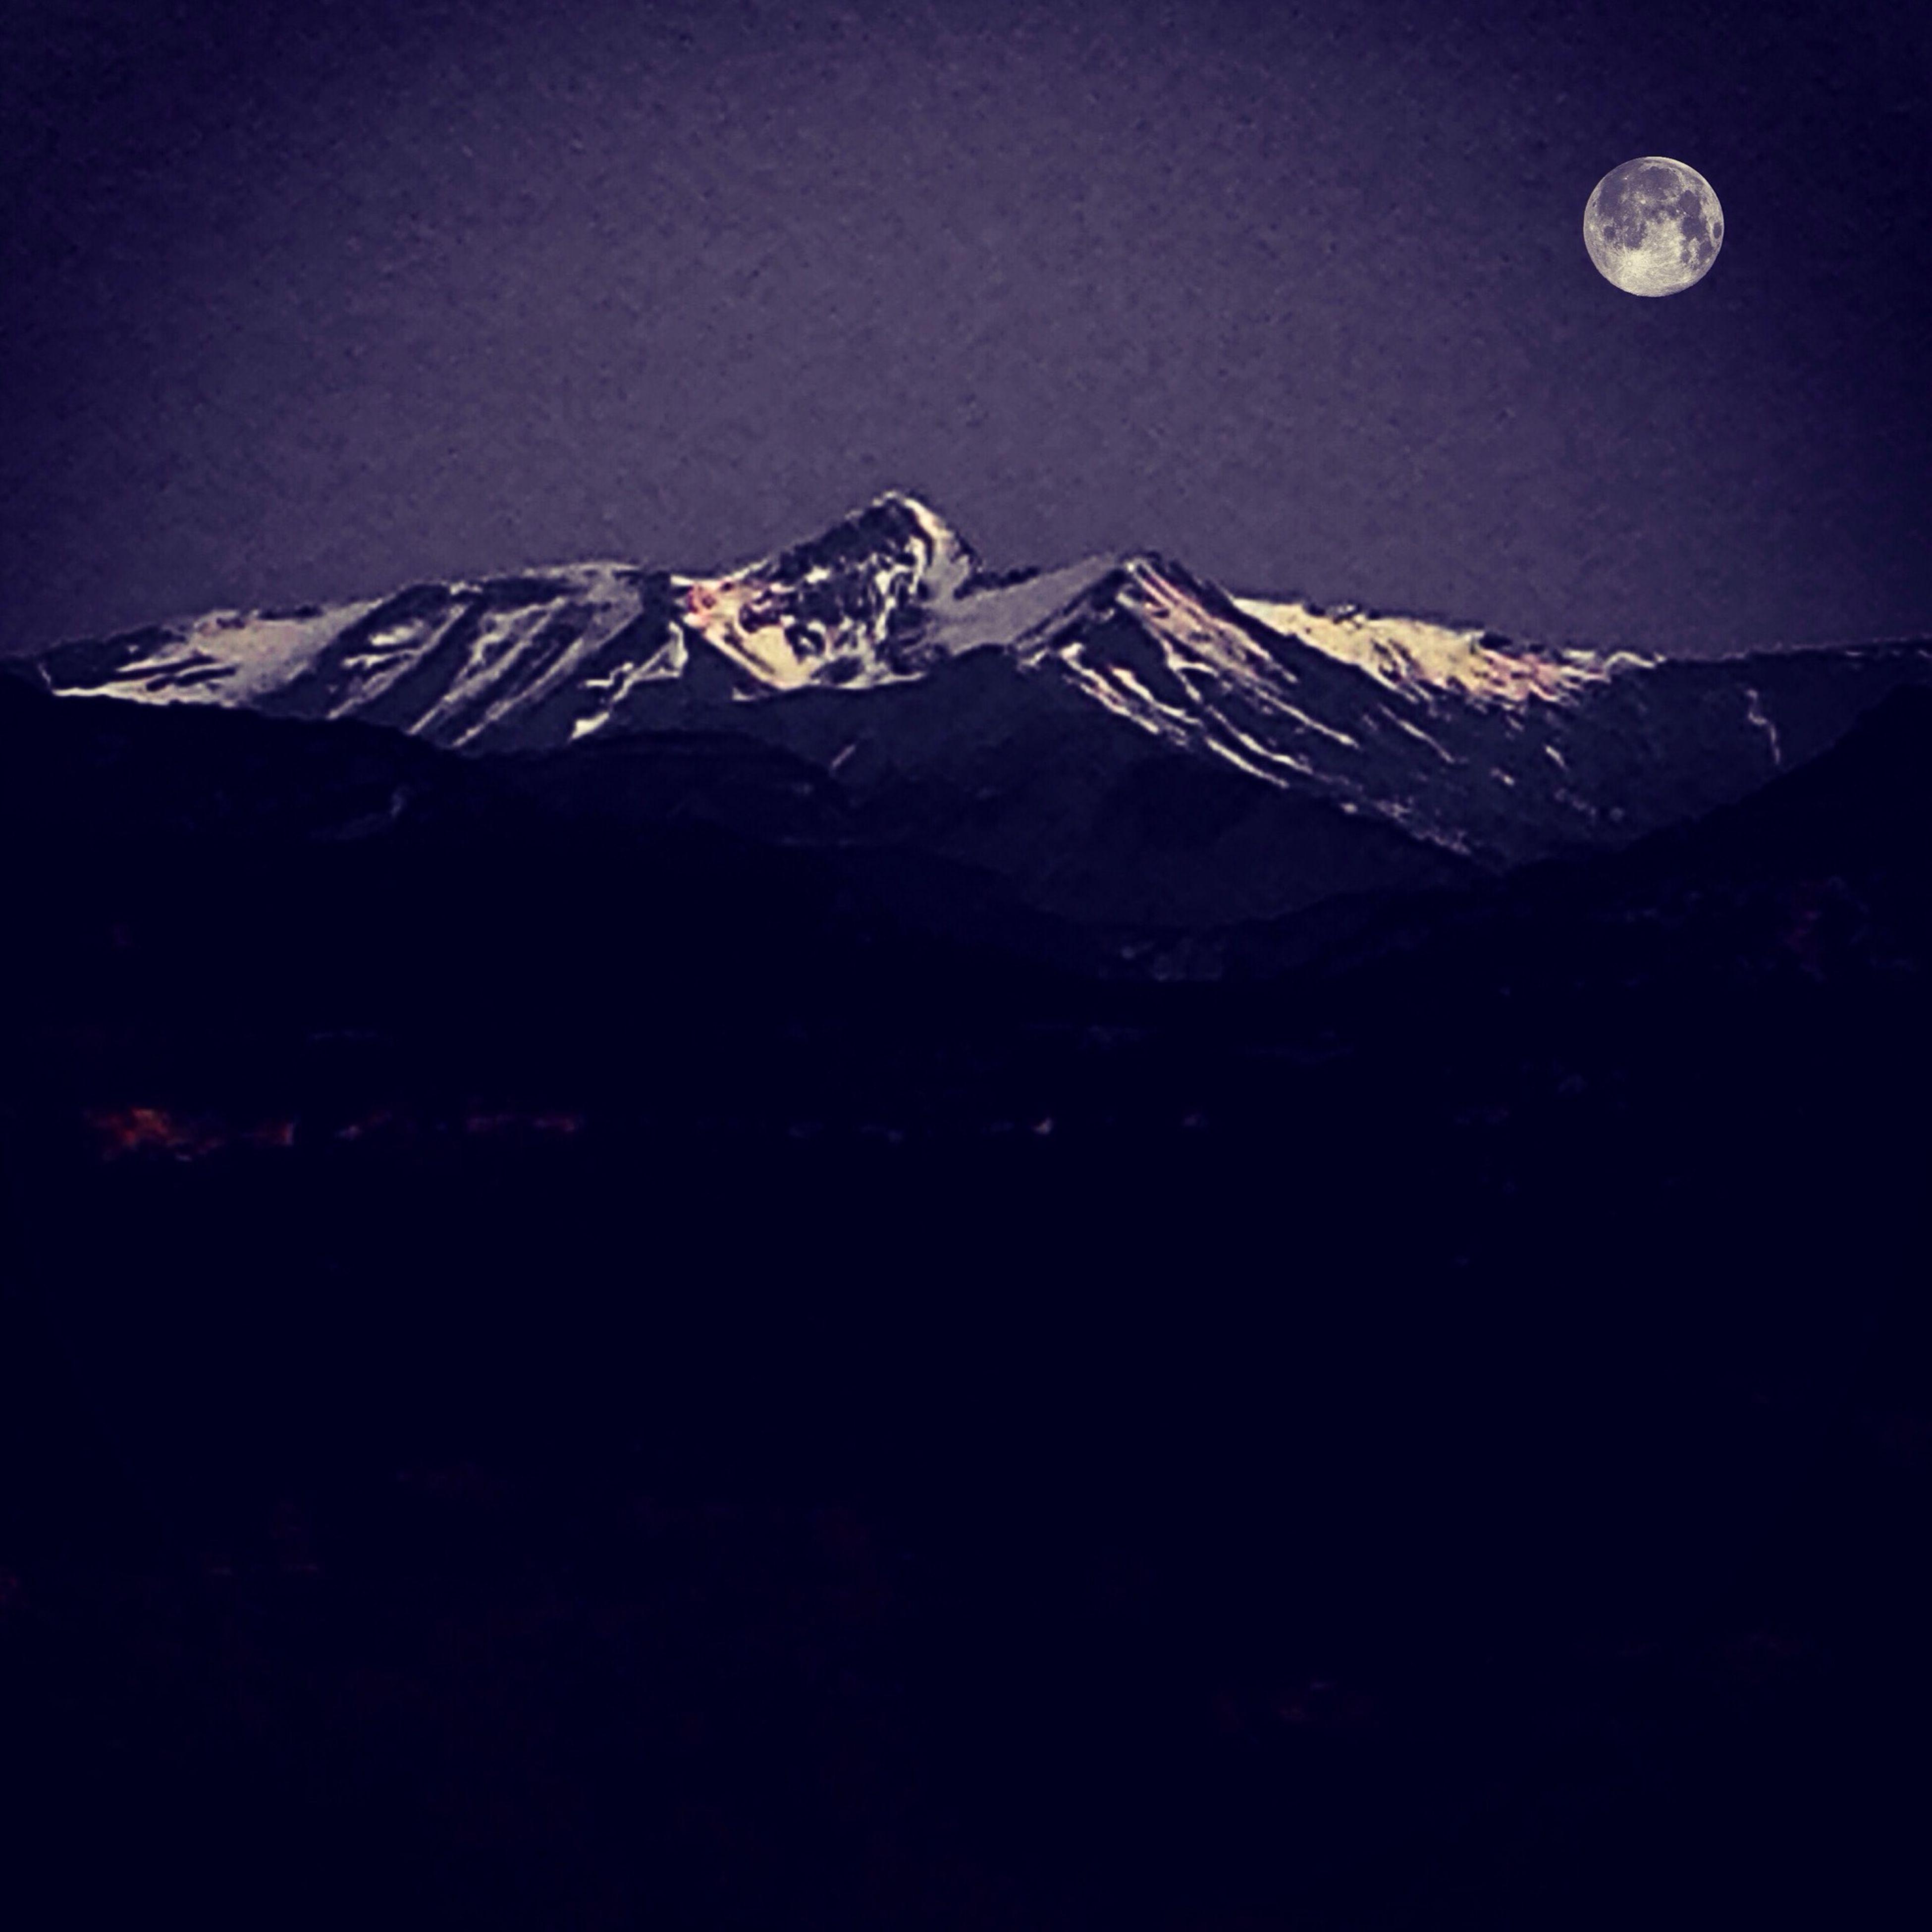 luna, luna llena llena de secretos y de penas Black & White Black And White Full Moon Moonlight Moon Thelightsideofthemoon